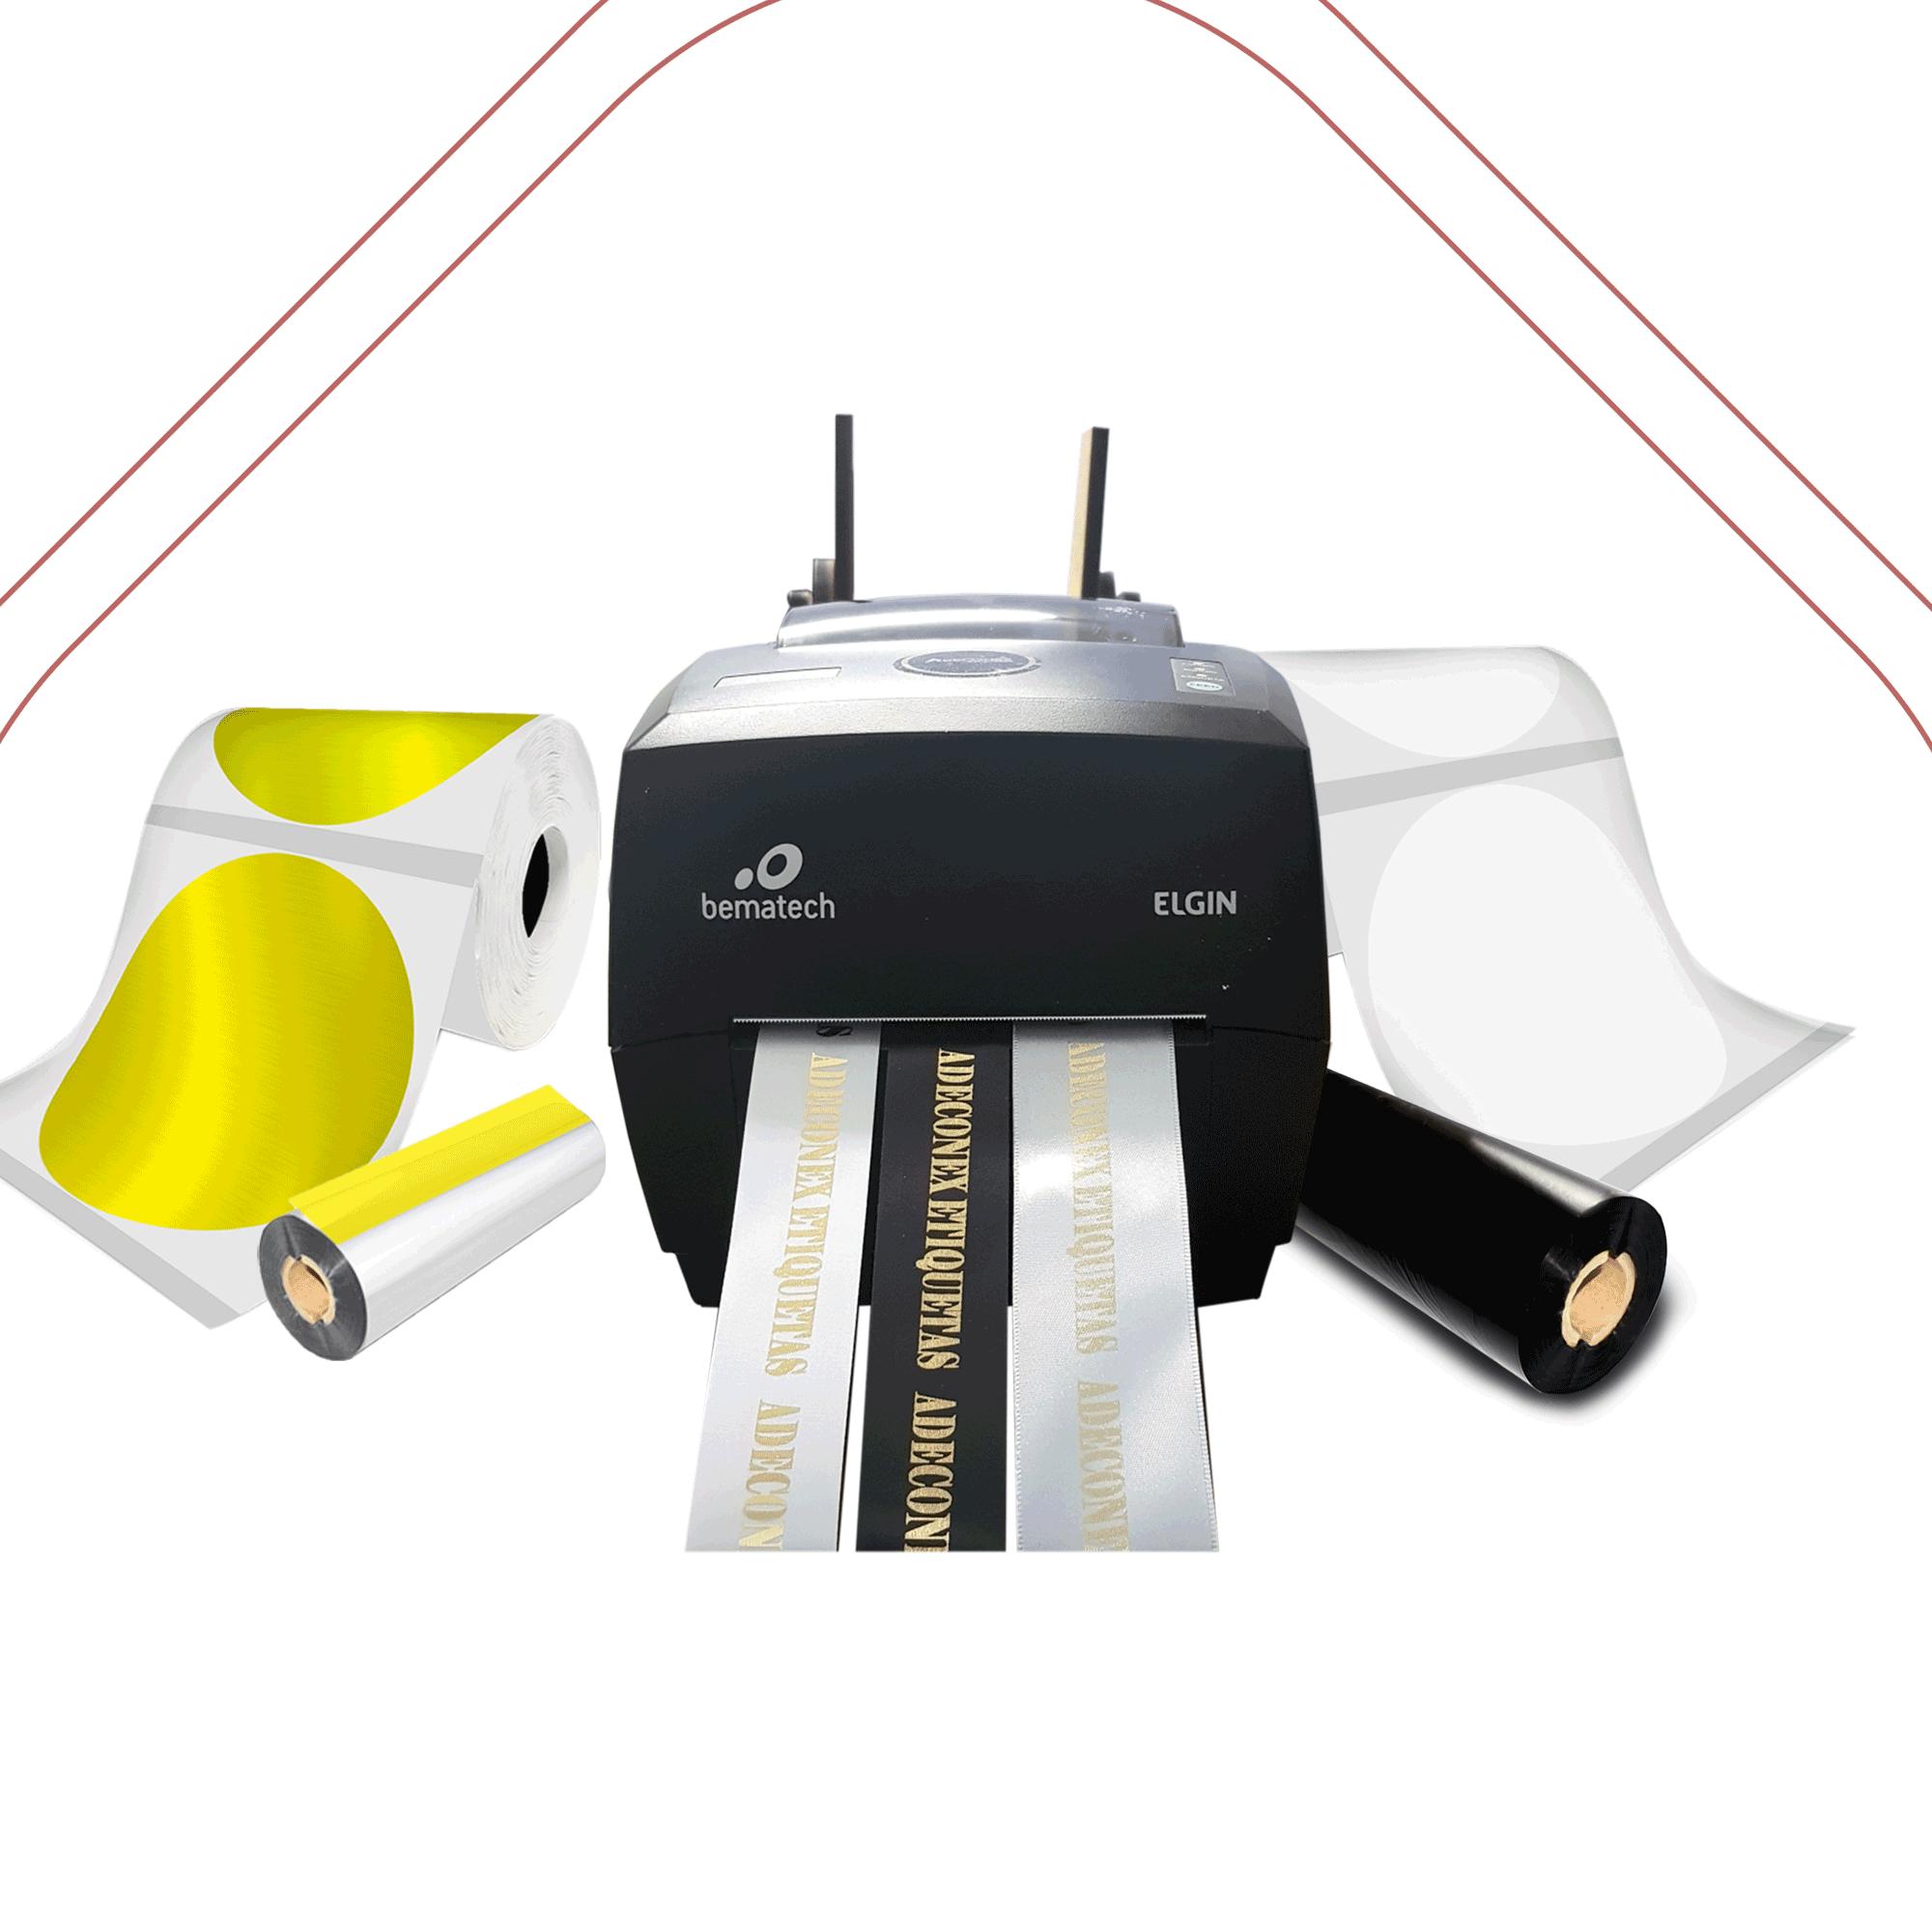 Kit Impressora Elgin L42 PRO + Etiqueta Redonda Transparente e Metalizada